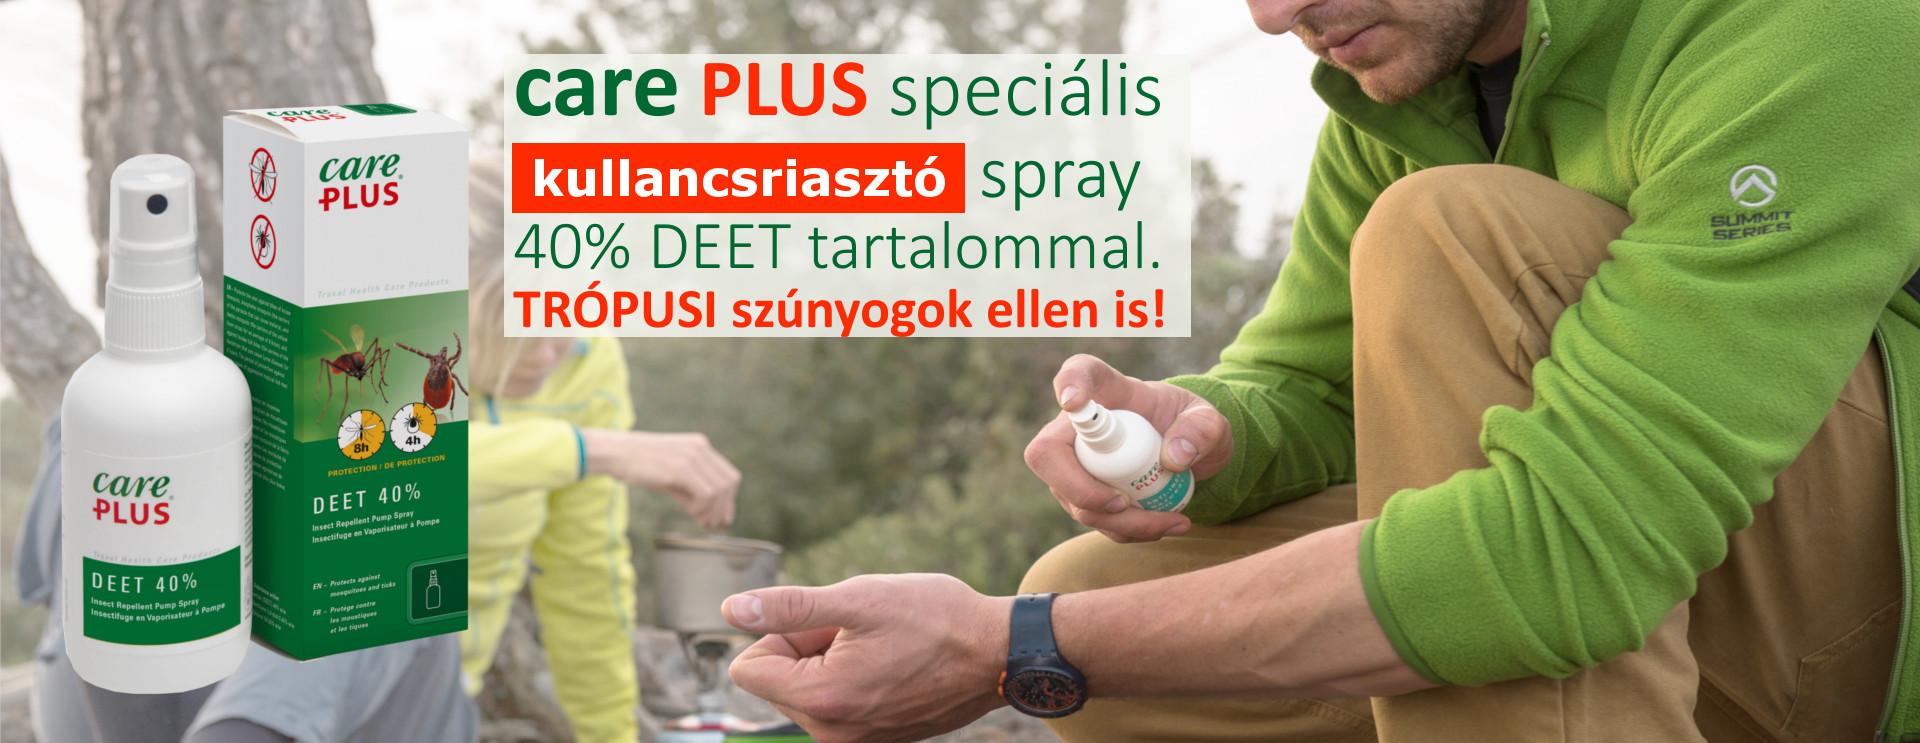 careplus-kullancsriasztó-spray